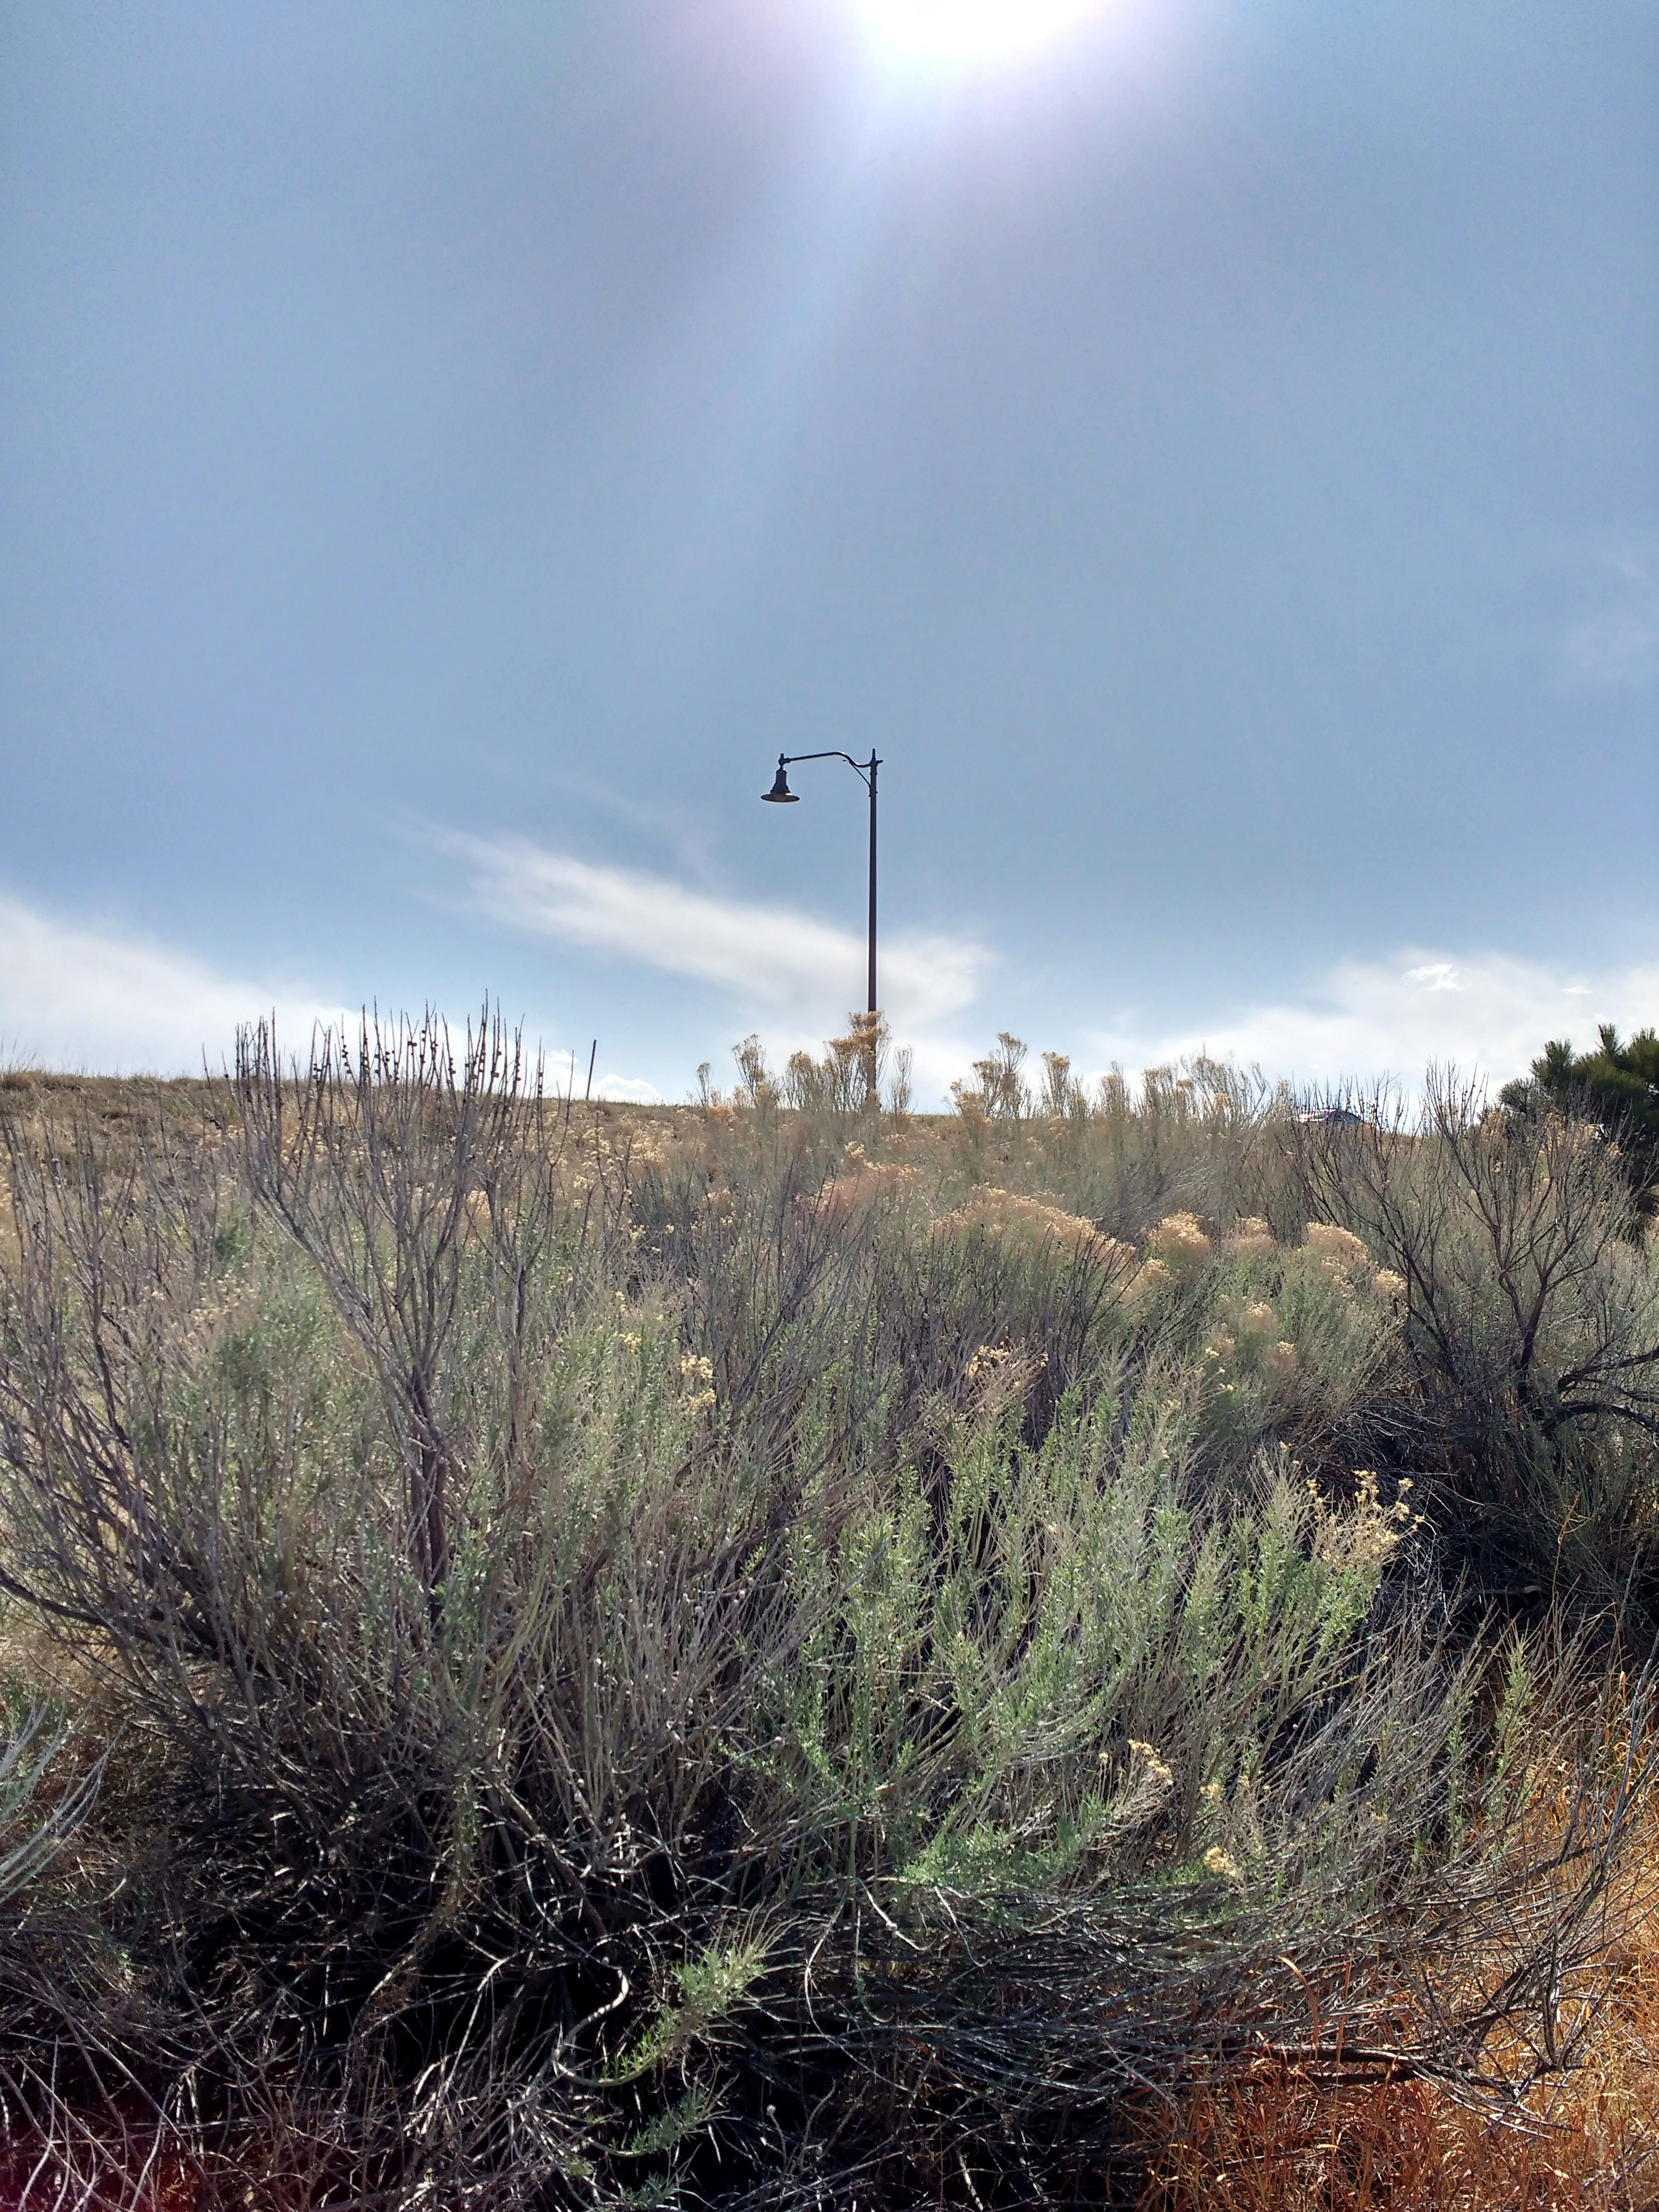 Lamp Post clipart public With Rabbitbrush Public Lamp Plant